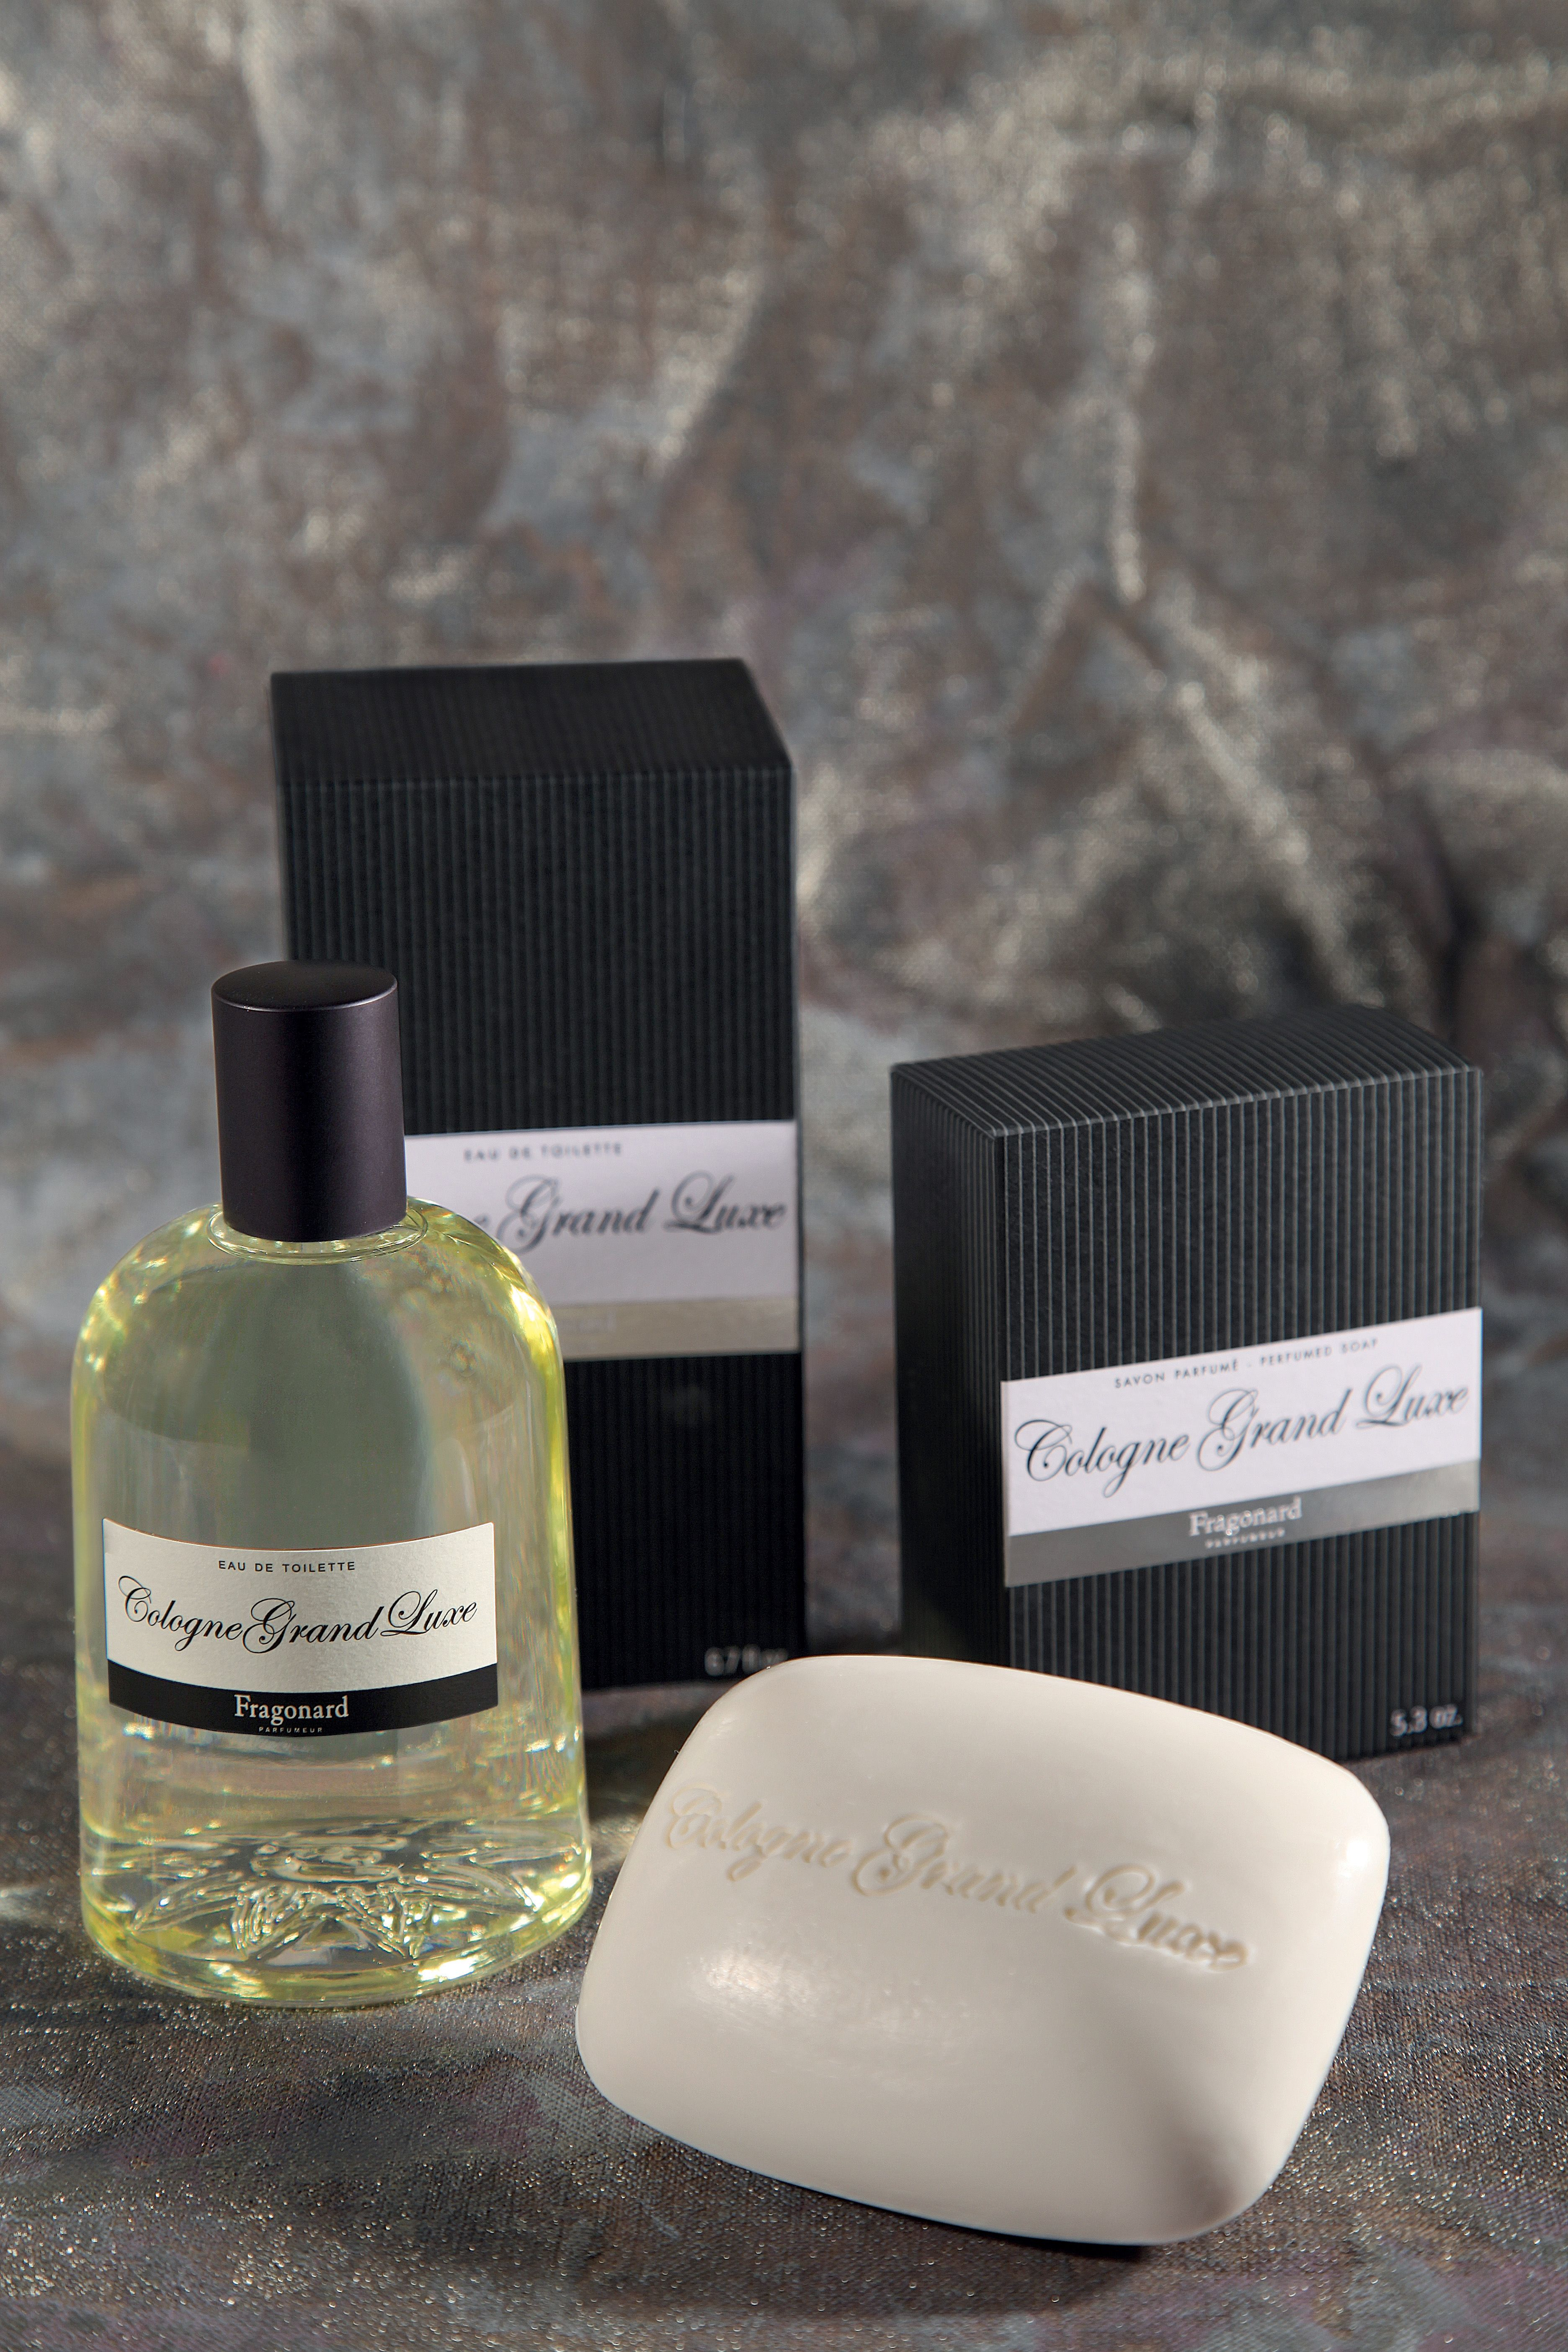 eau de toilette cologne grand luxe for men fragonard parfumeur fragonard perfume homme. Black Bedroom Furniture Sets. Home Design Ideas